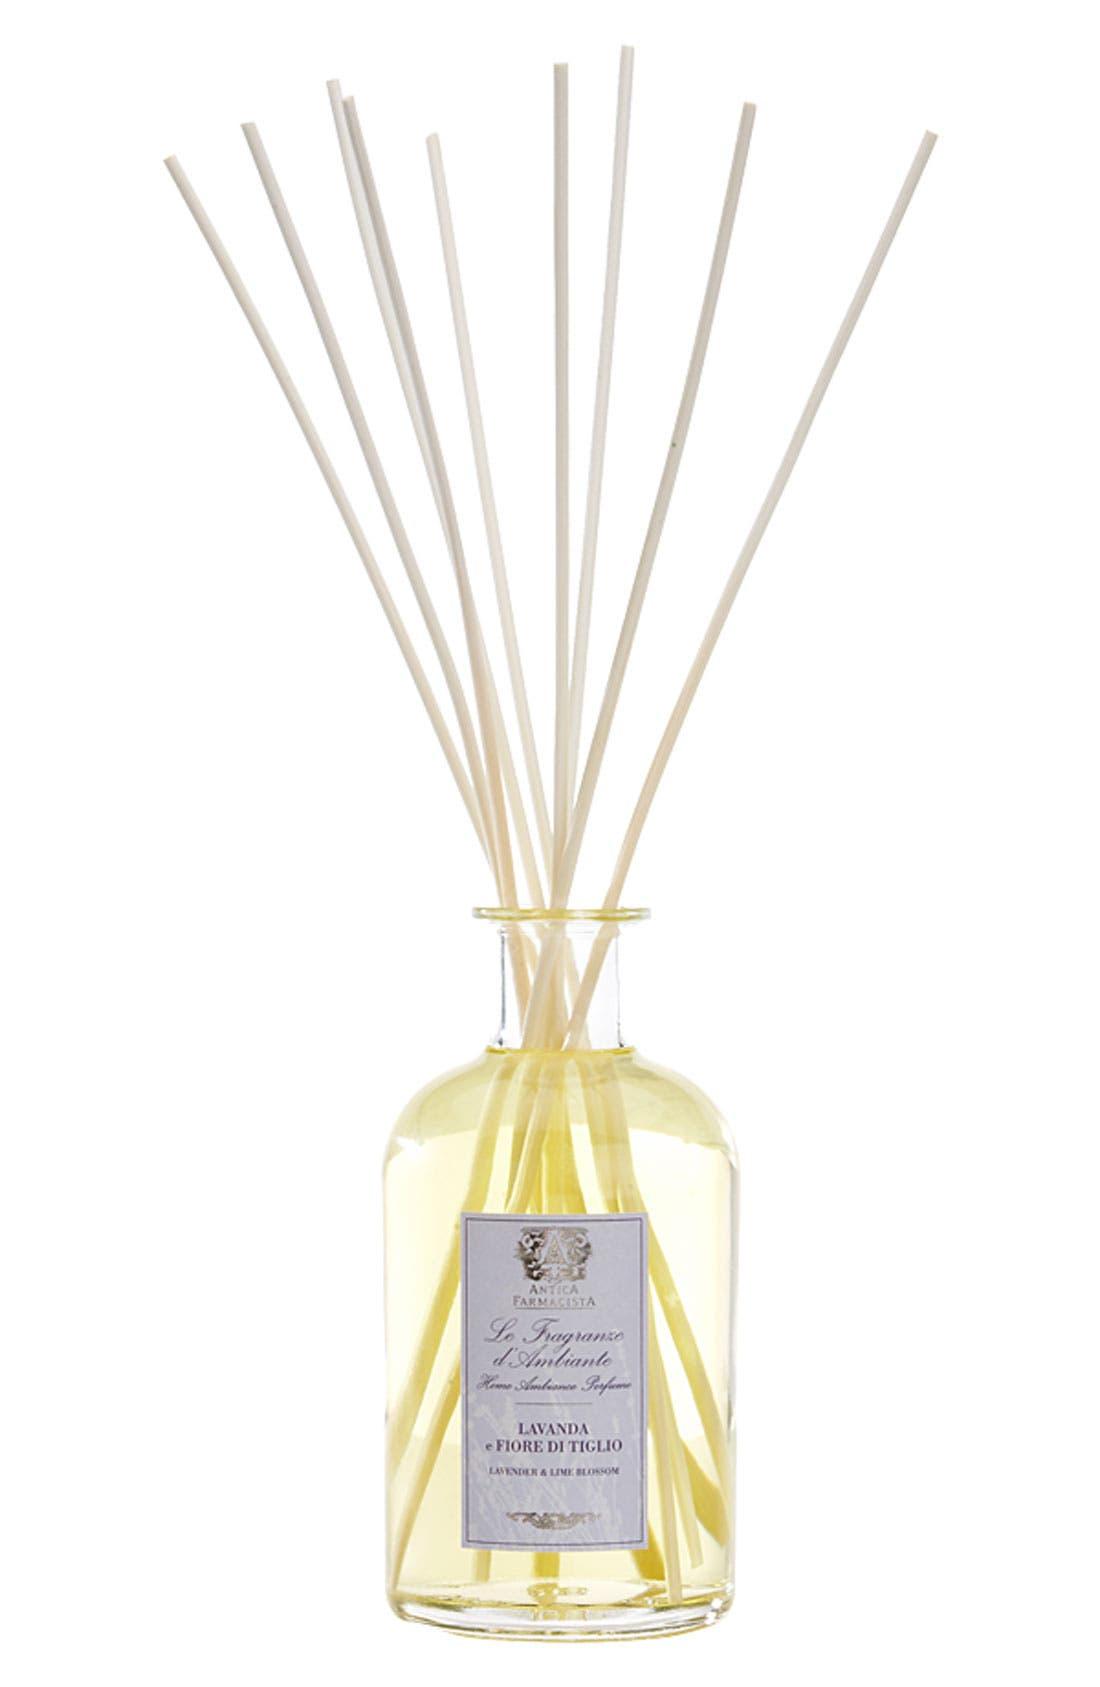 Antica Farmacista Lavender & Lime Blossom Home Ambiance Perfume